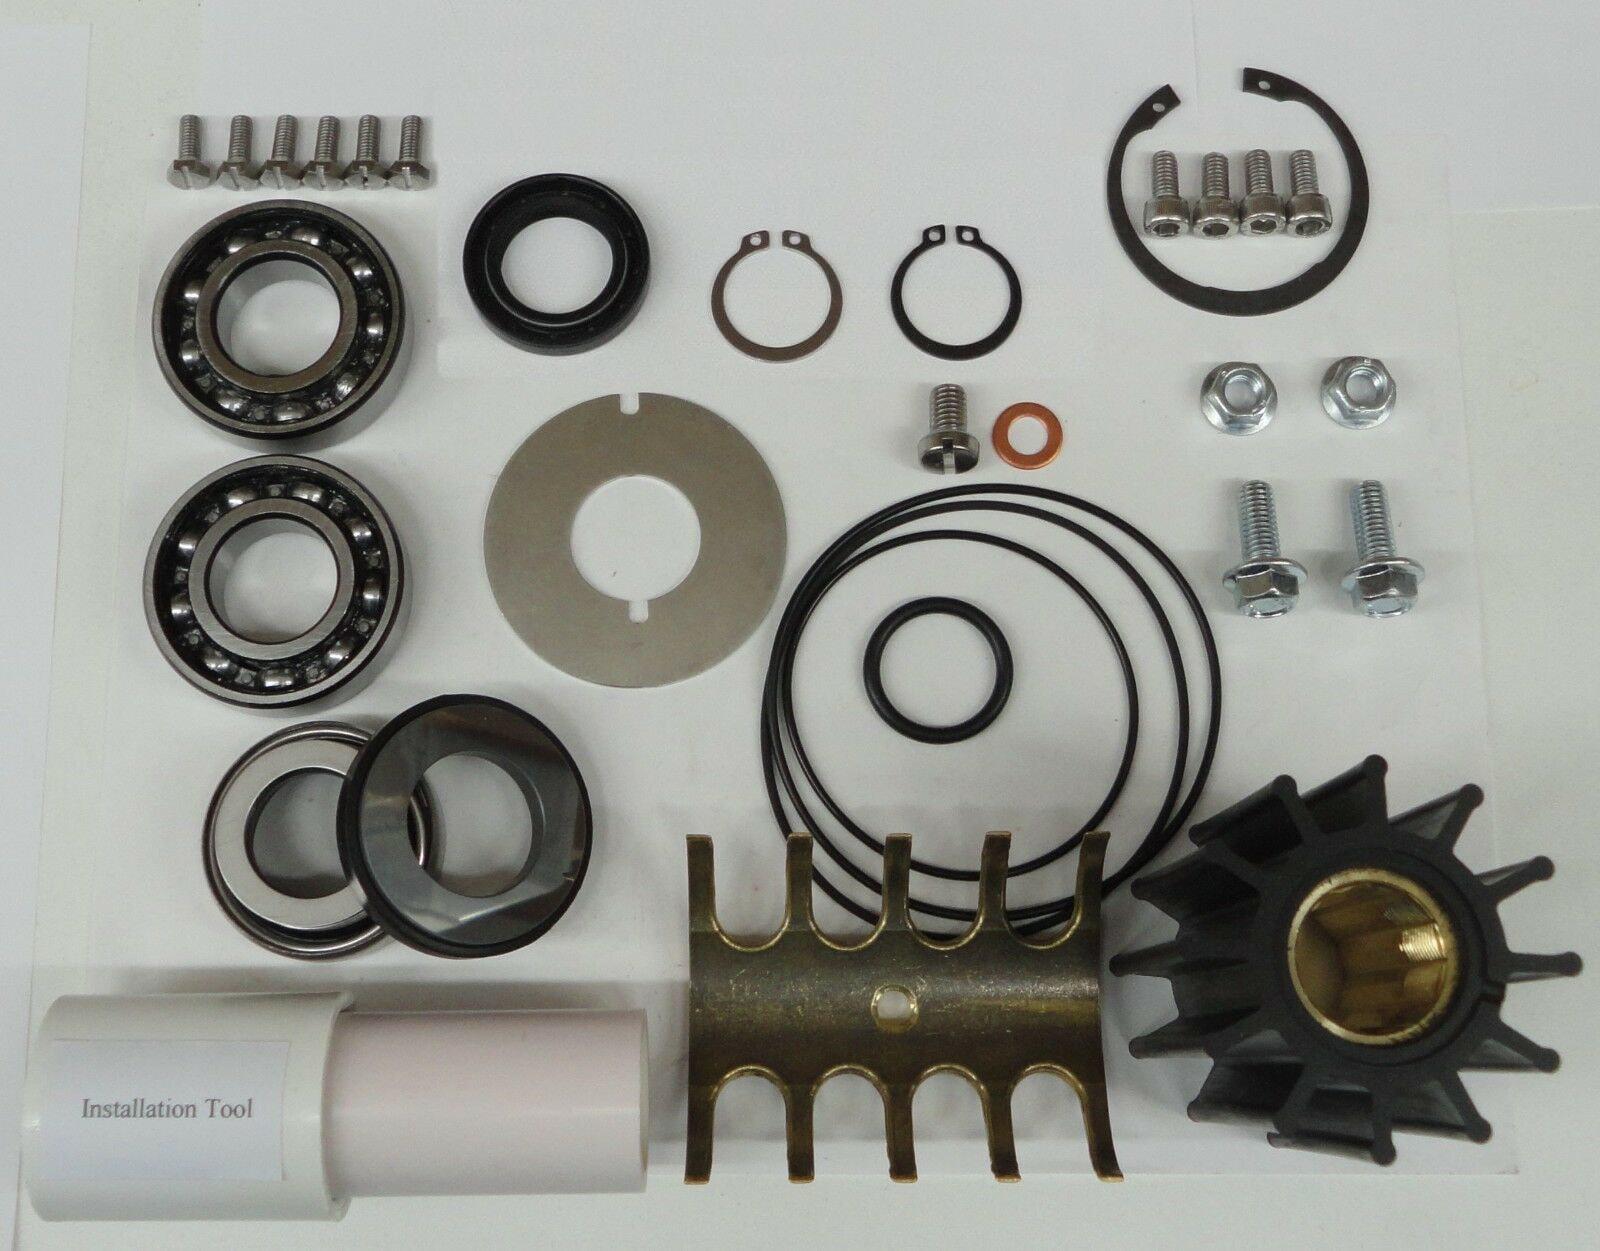 Fuel Injector Seal Kit Walker Products 17111 fits 86-91 Mazda RX-7 1.3L-R2